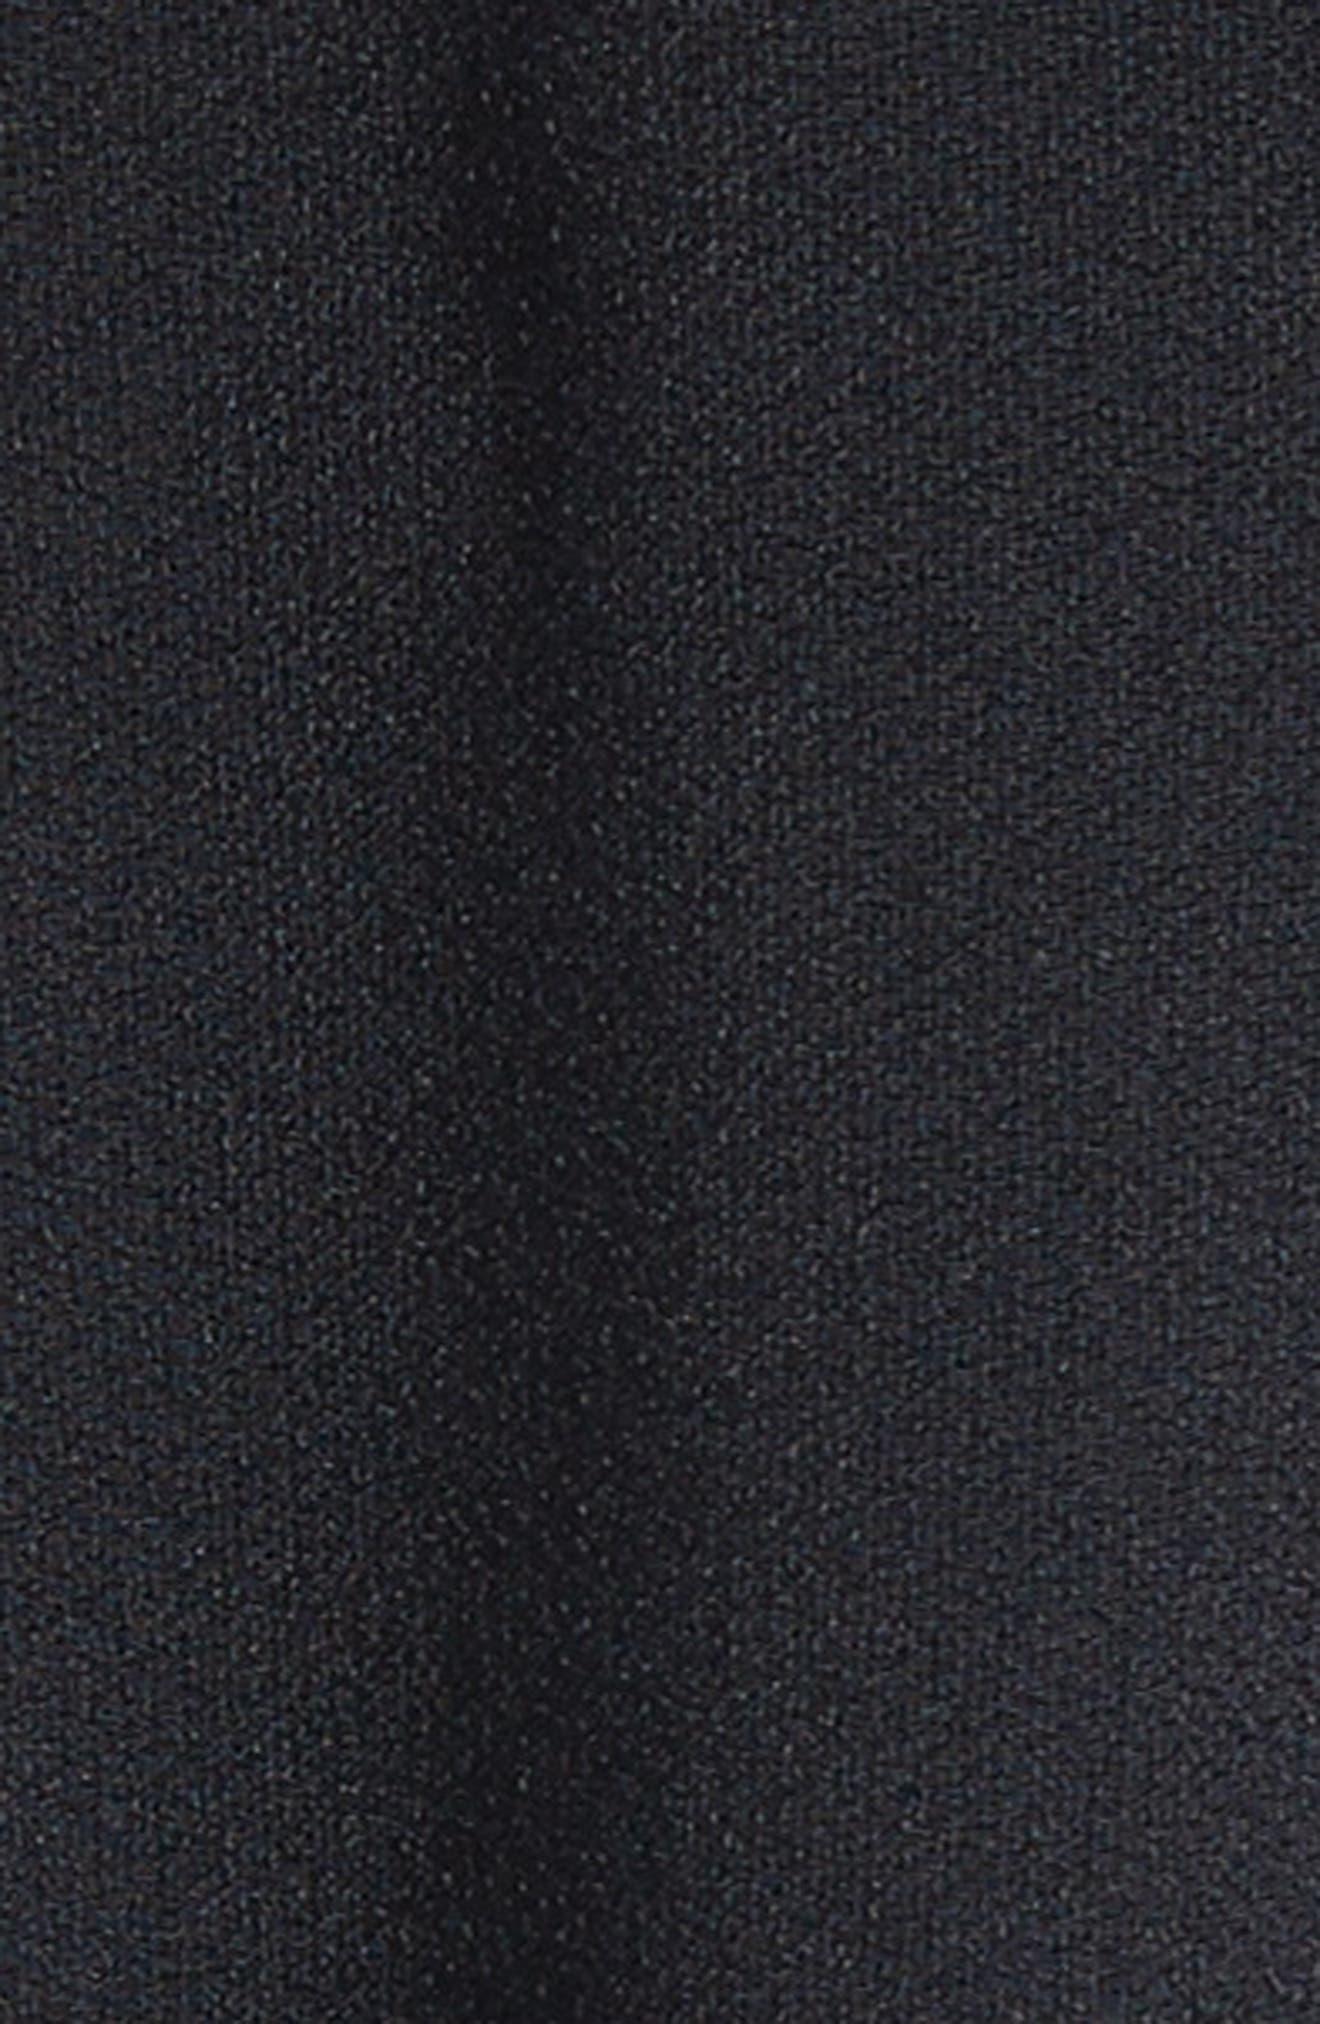 Flared Satin Back Crepe Dress,                             Alternate thumbnail 5, color,                             001